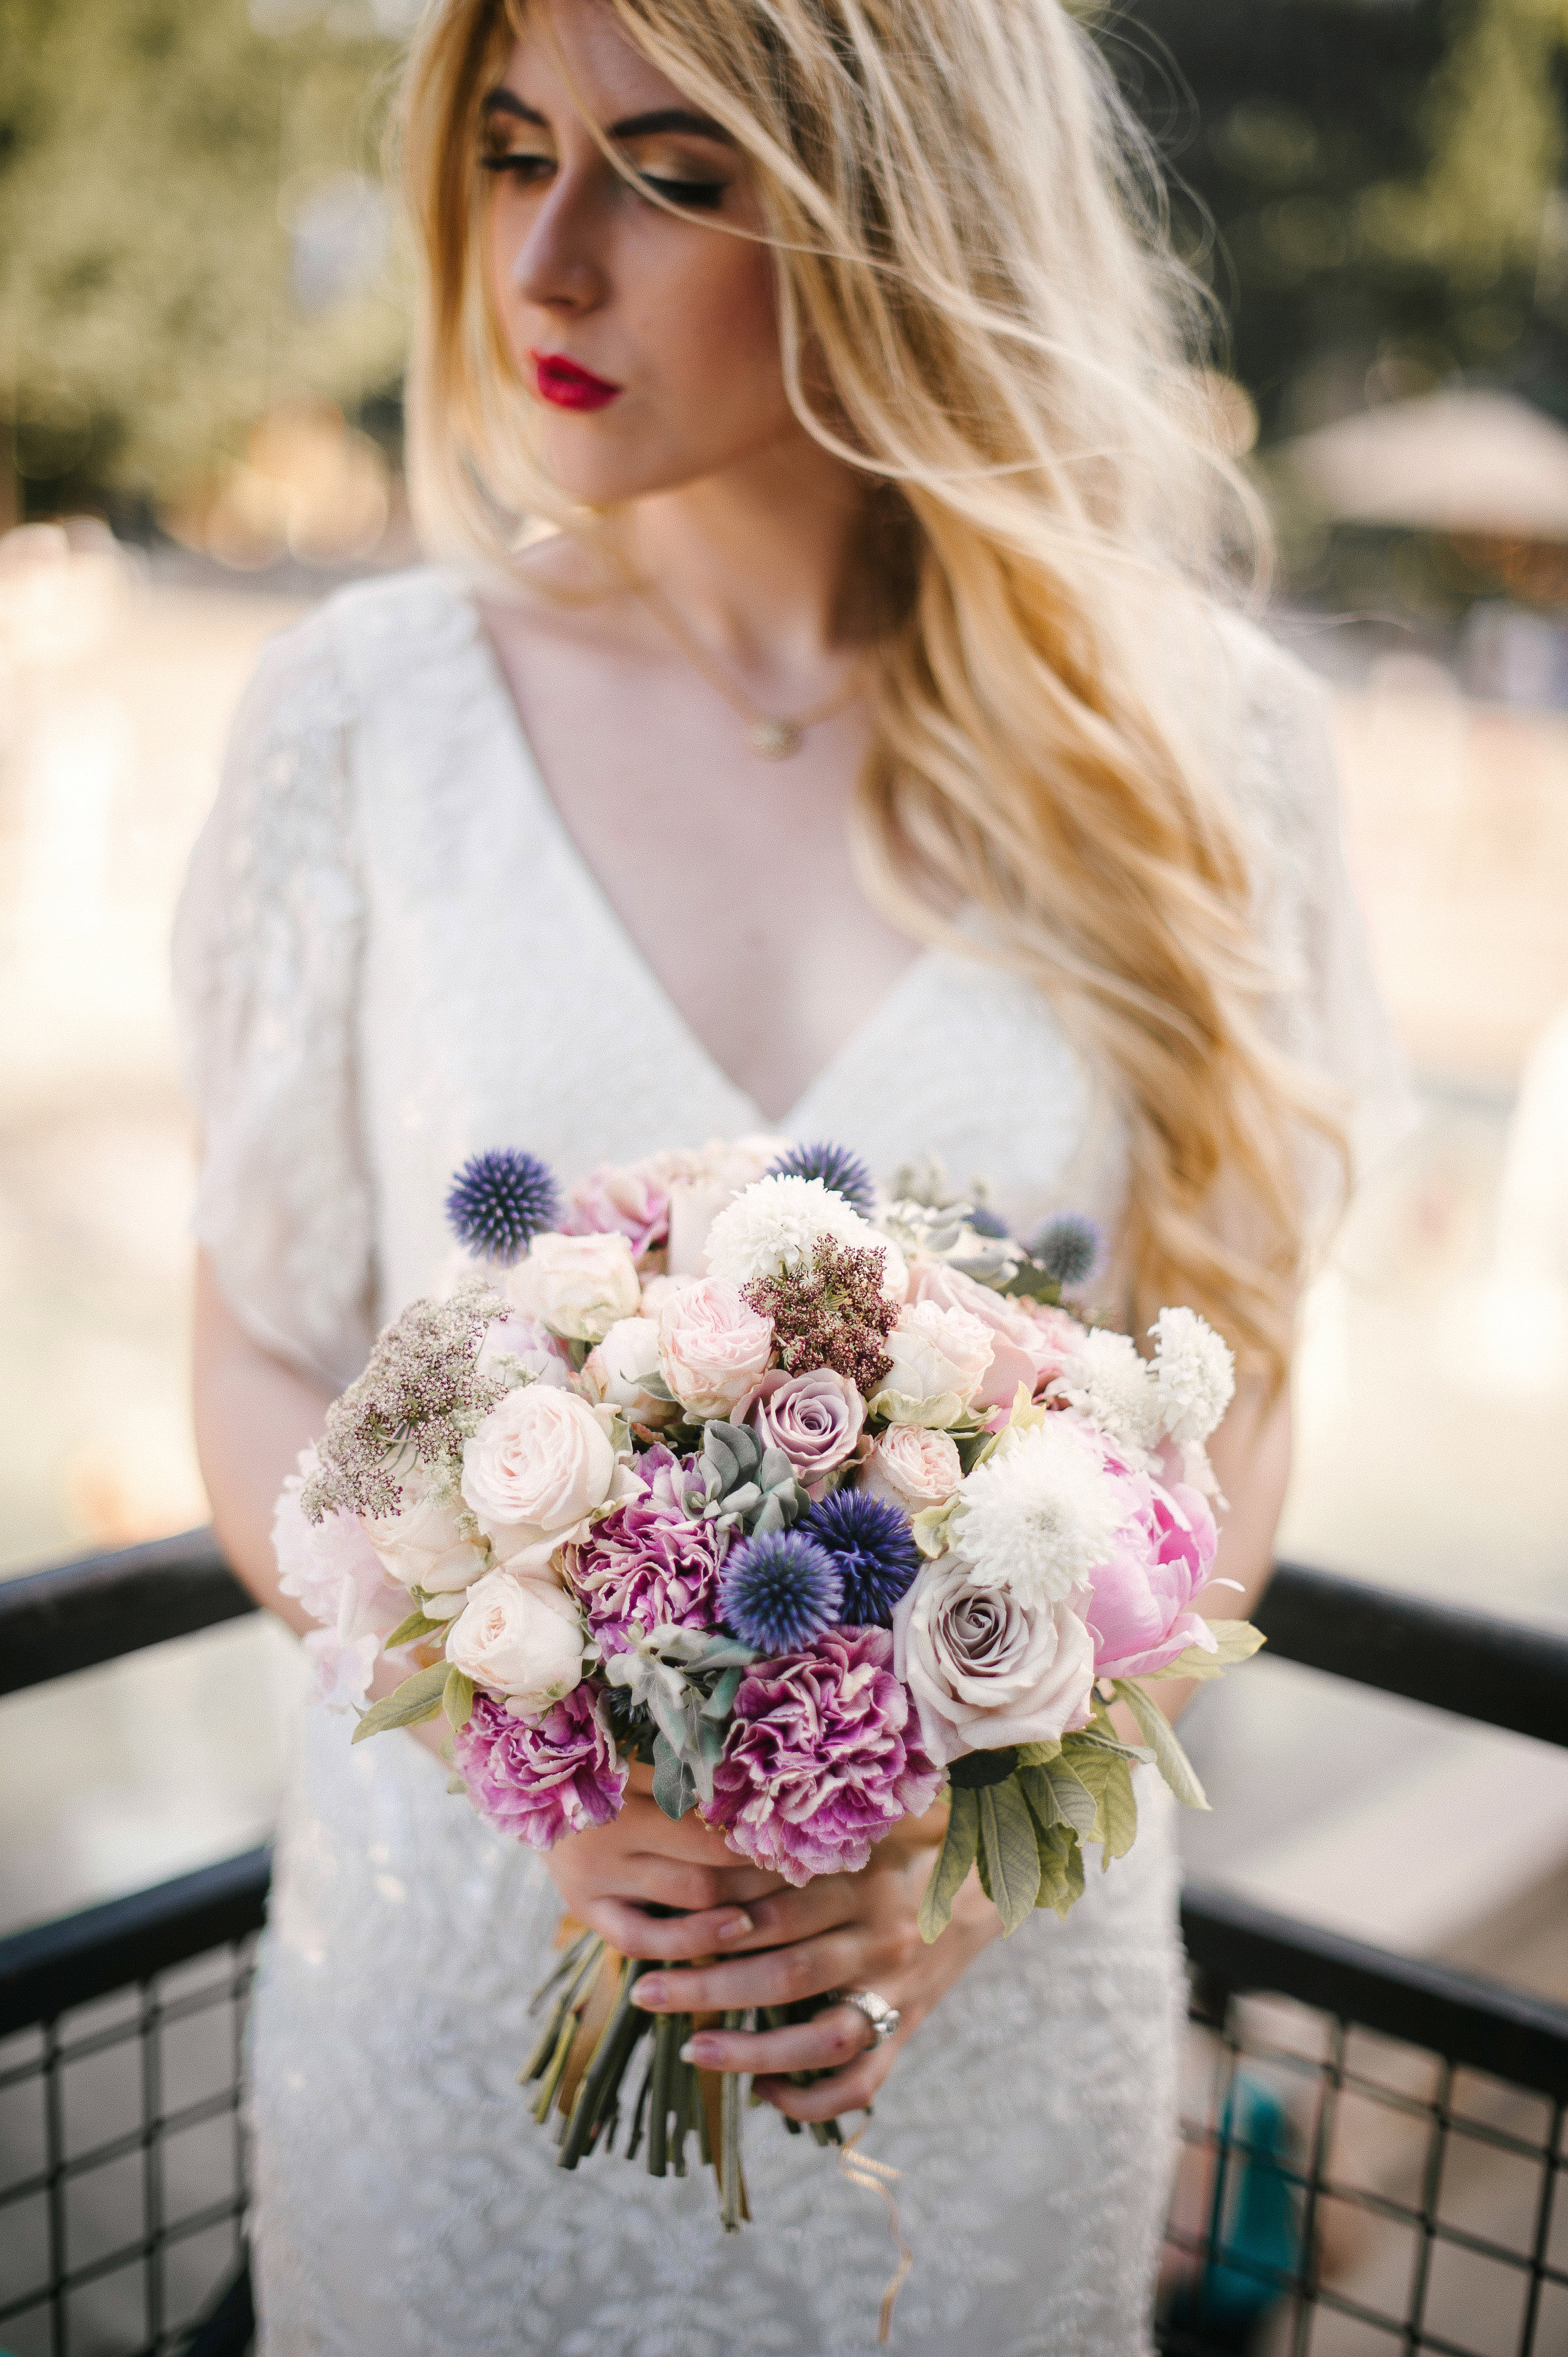 bouquet-mariee-rose-blanc-bleu-menthe-sauvage-fleuriste-mariage-lyon-the-great-palette-menthe-sauvage-fleuriste-mariage-lyon-the-great-palette-2(112)